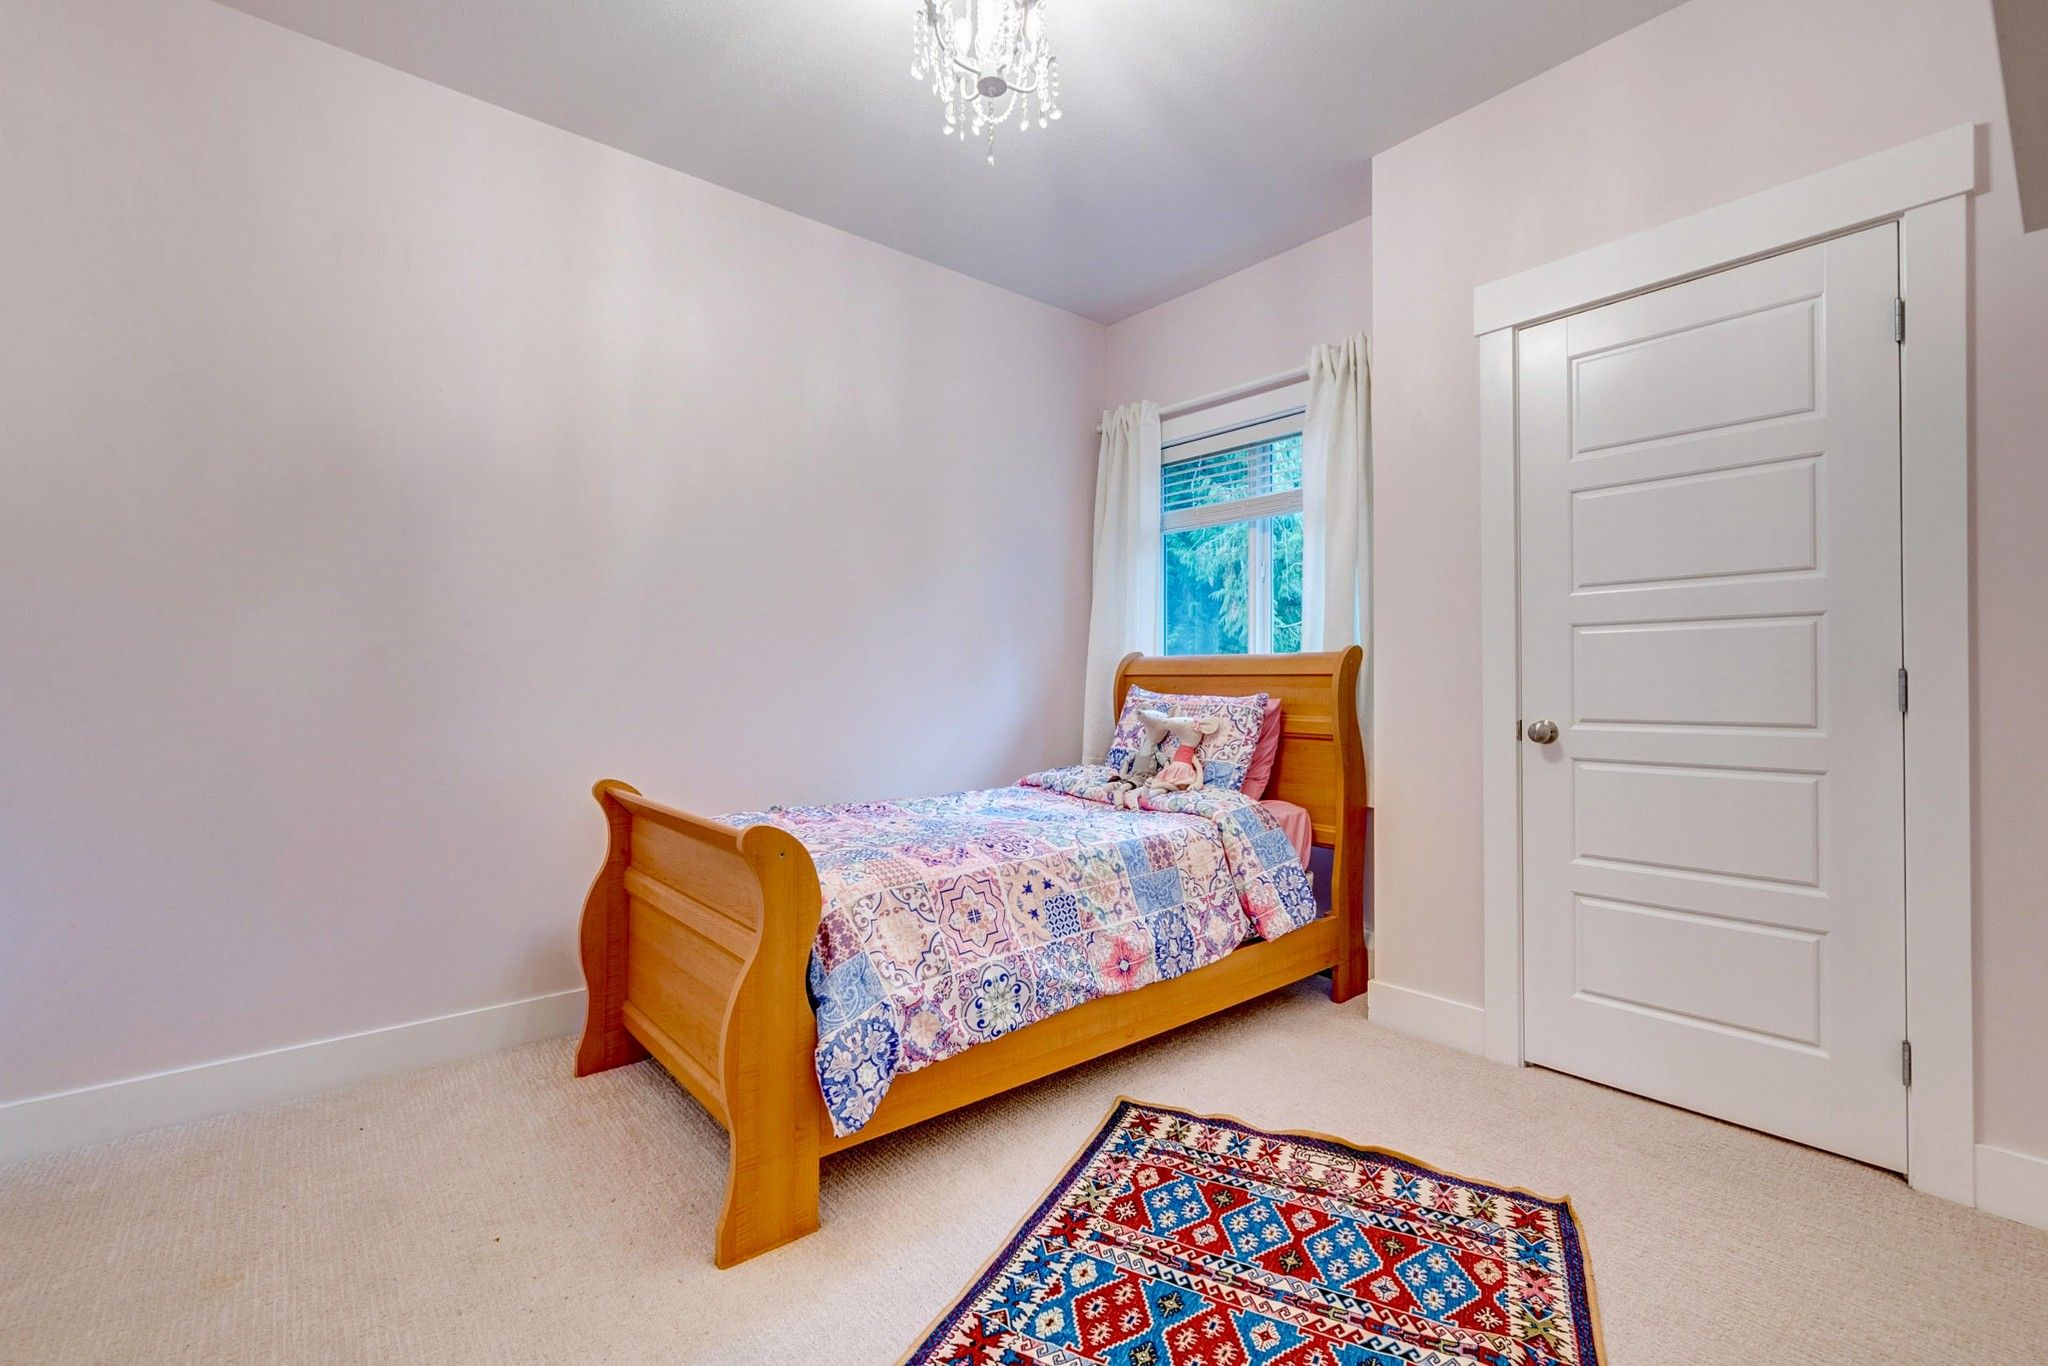 Photo 15: Photos: 1303 Hollybrook Street in Coquitlam: Burke Mountain House for sale : MLS®# R2423196